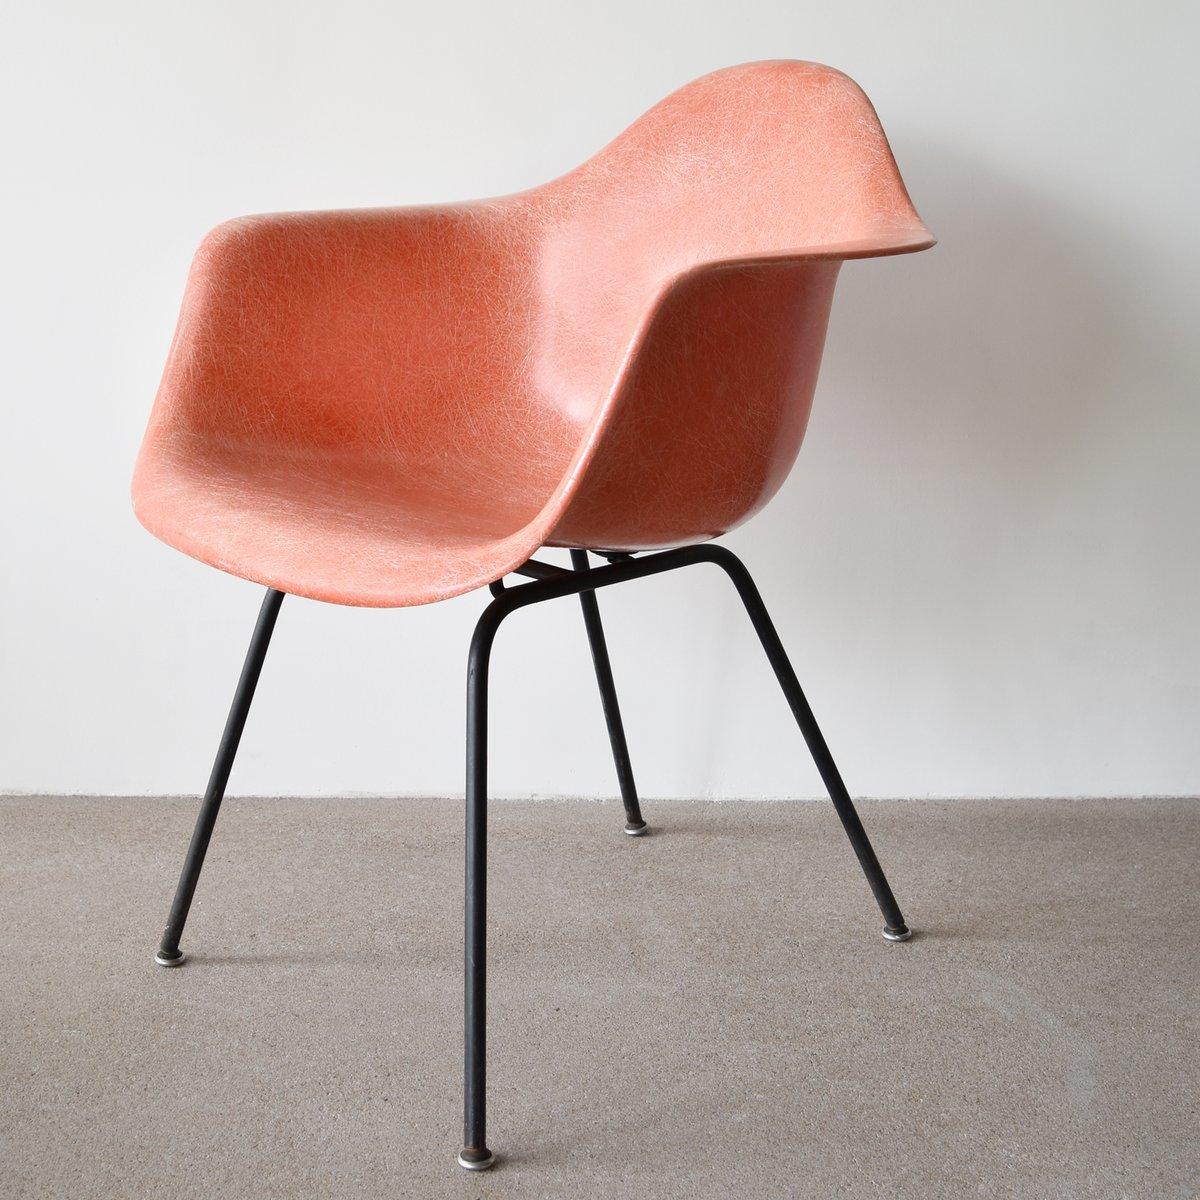 lachsroter dax stuhl von charles und ray eames f r herman. Black Bedroom Furniture Sets. Home Design Ideas